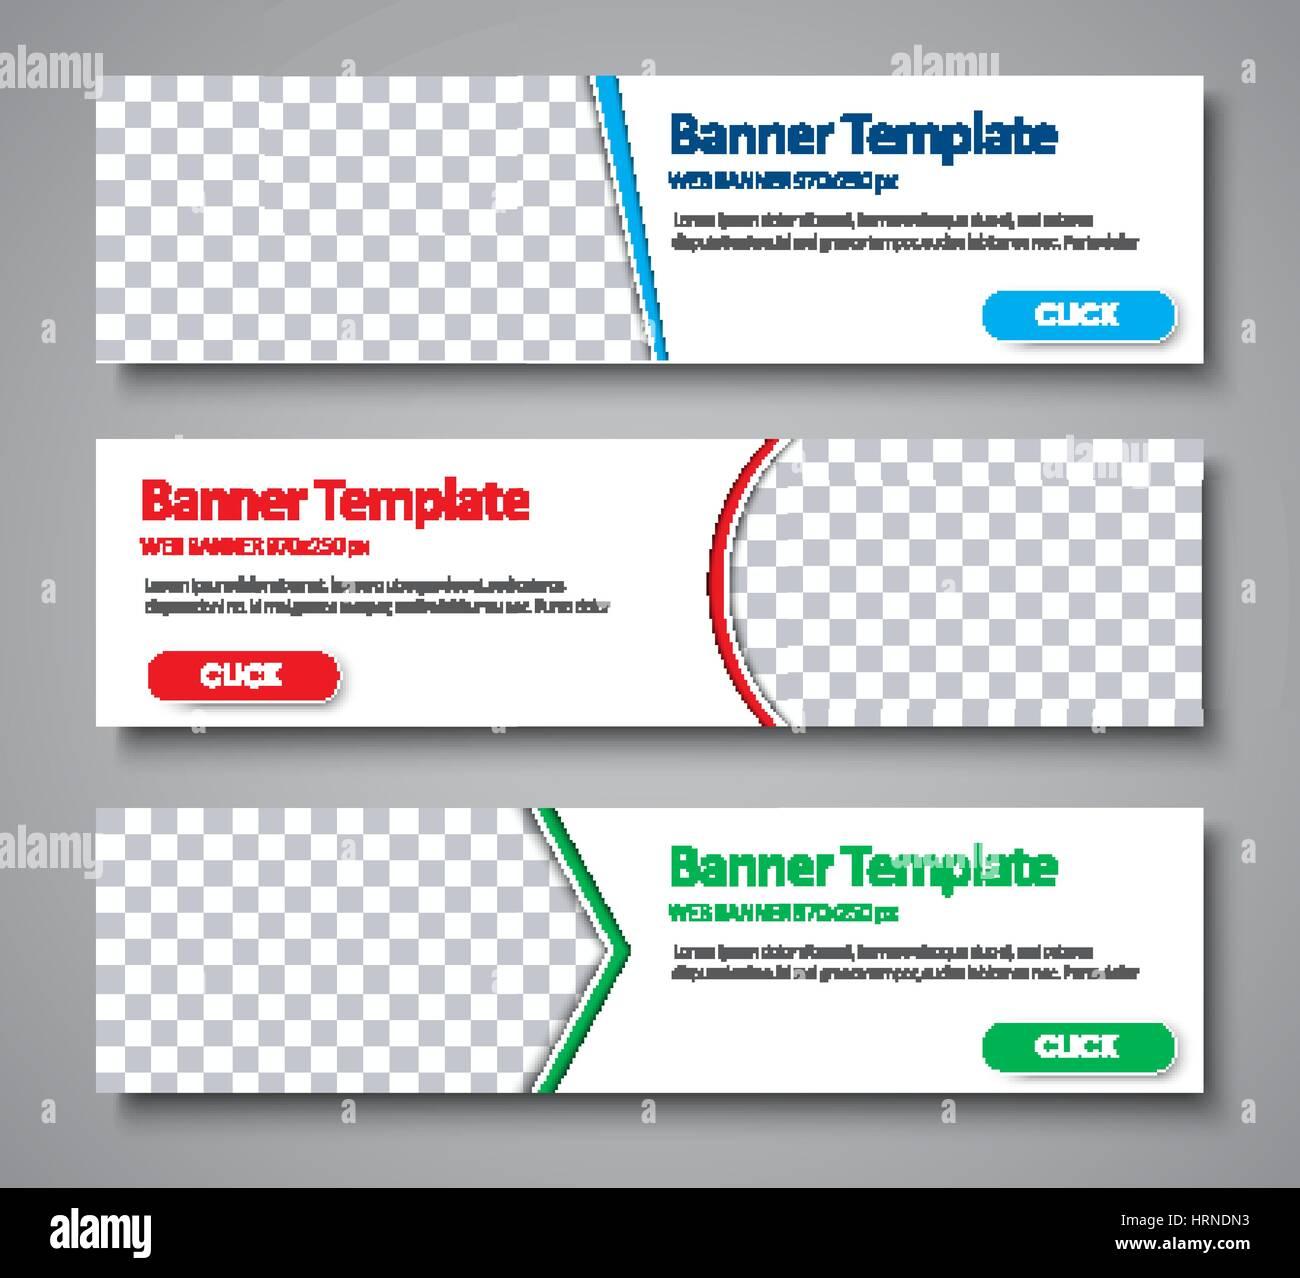 web banner template